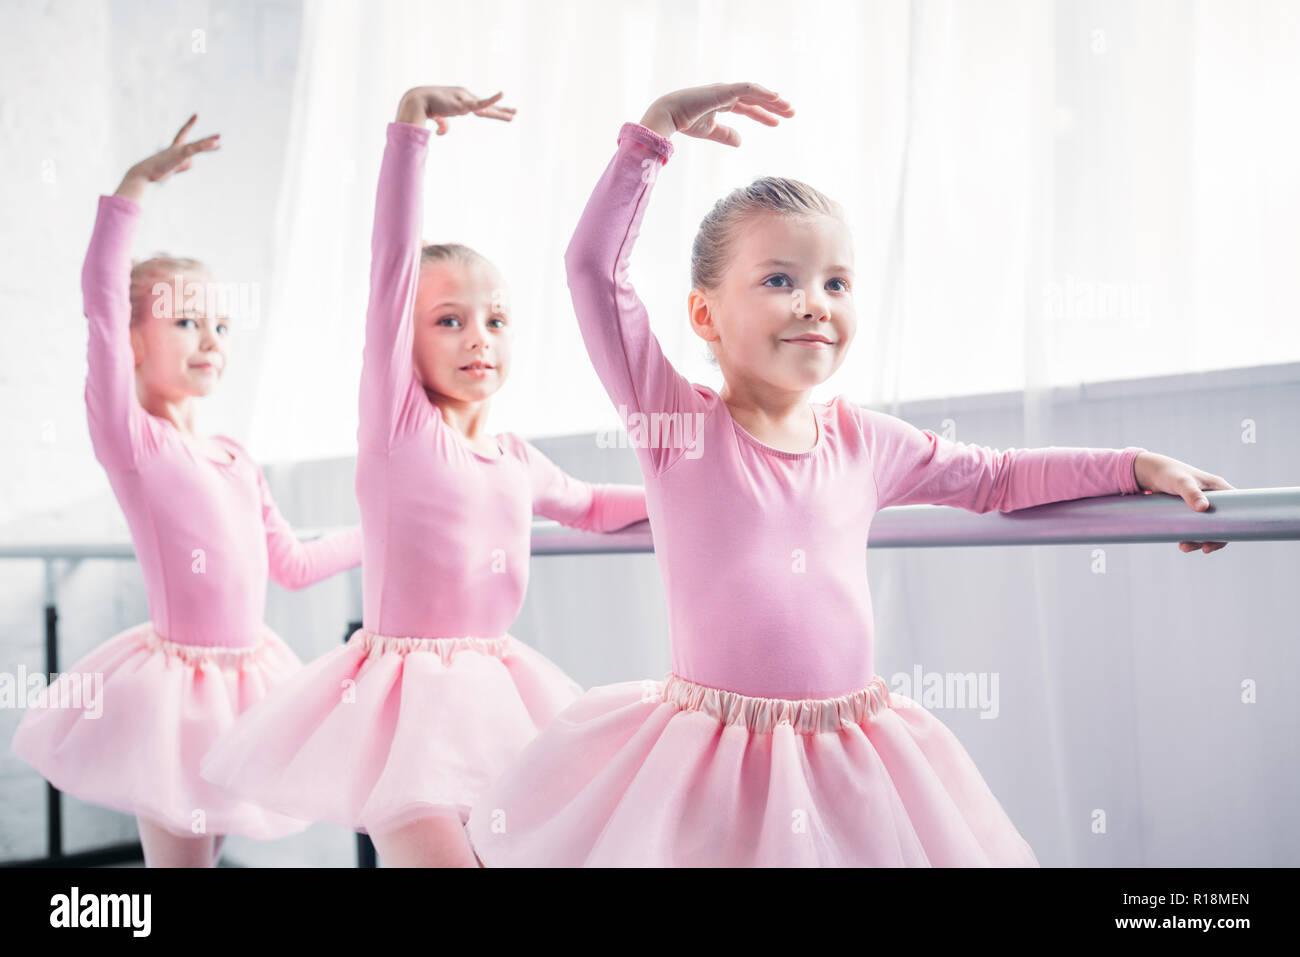 adorable smiling children in pink tutu skirts dancing in ballet studio - Stock Image